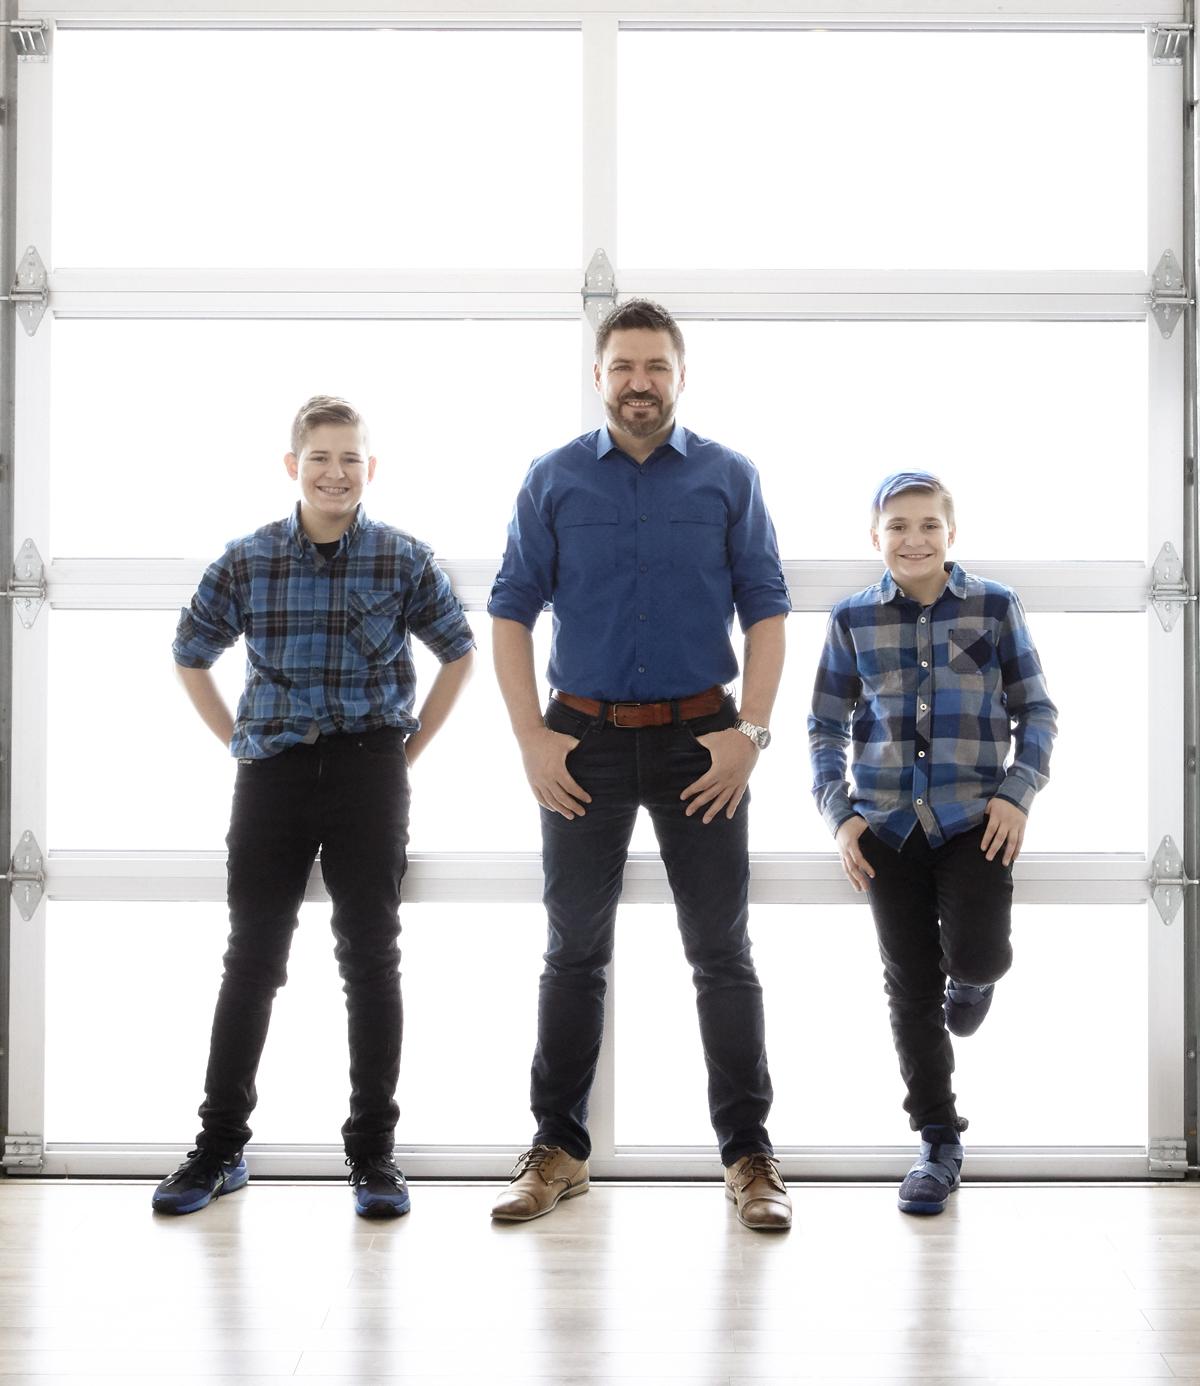 cindy-moleski-professional-family-father son-boys-portrait-photographer-saskatoon-saskatchewan-29451-103.jpg